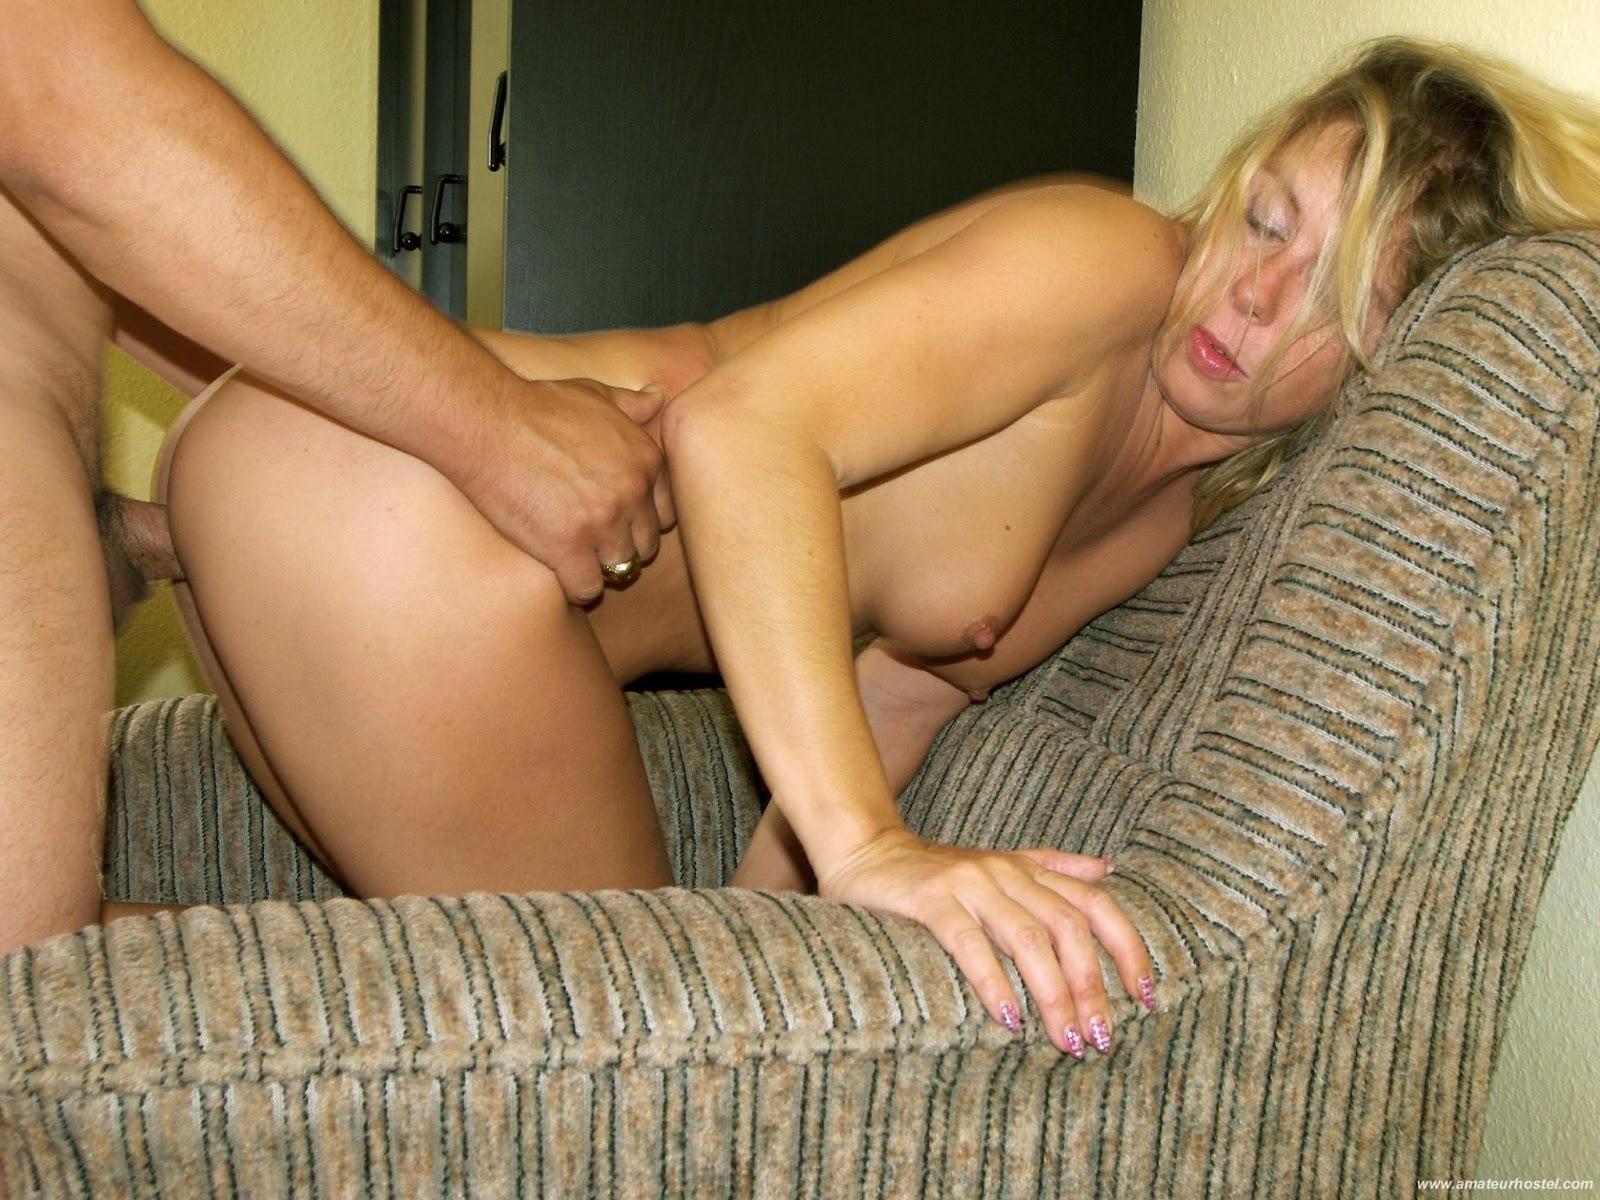 anal newbie nudes - Newbienudes sex newbienudes anal mature, mature in spandex, mature granny  scatt, amature orgy tubes, video girl mature, lesbienne femme mature.